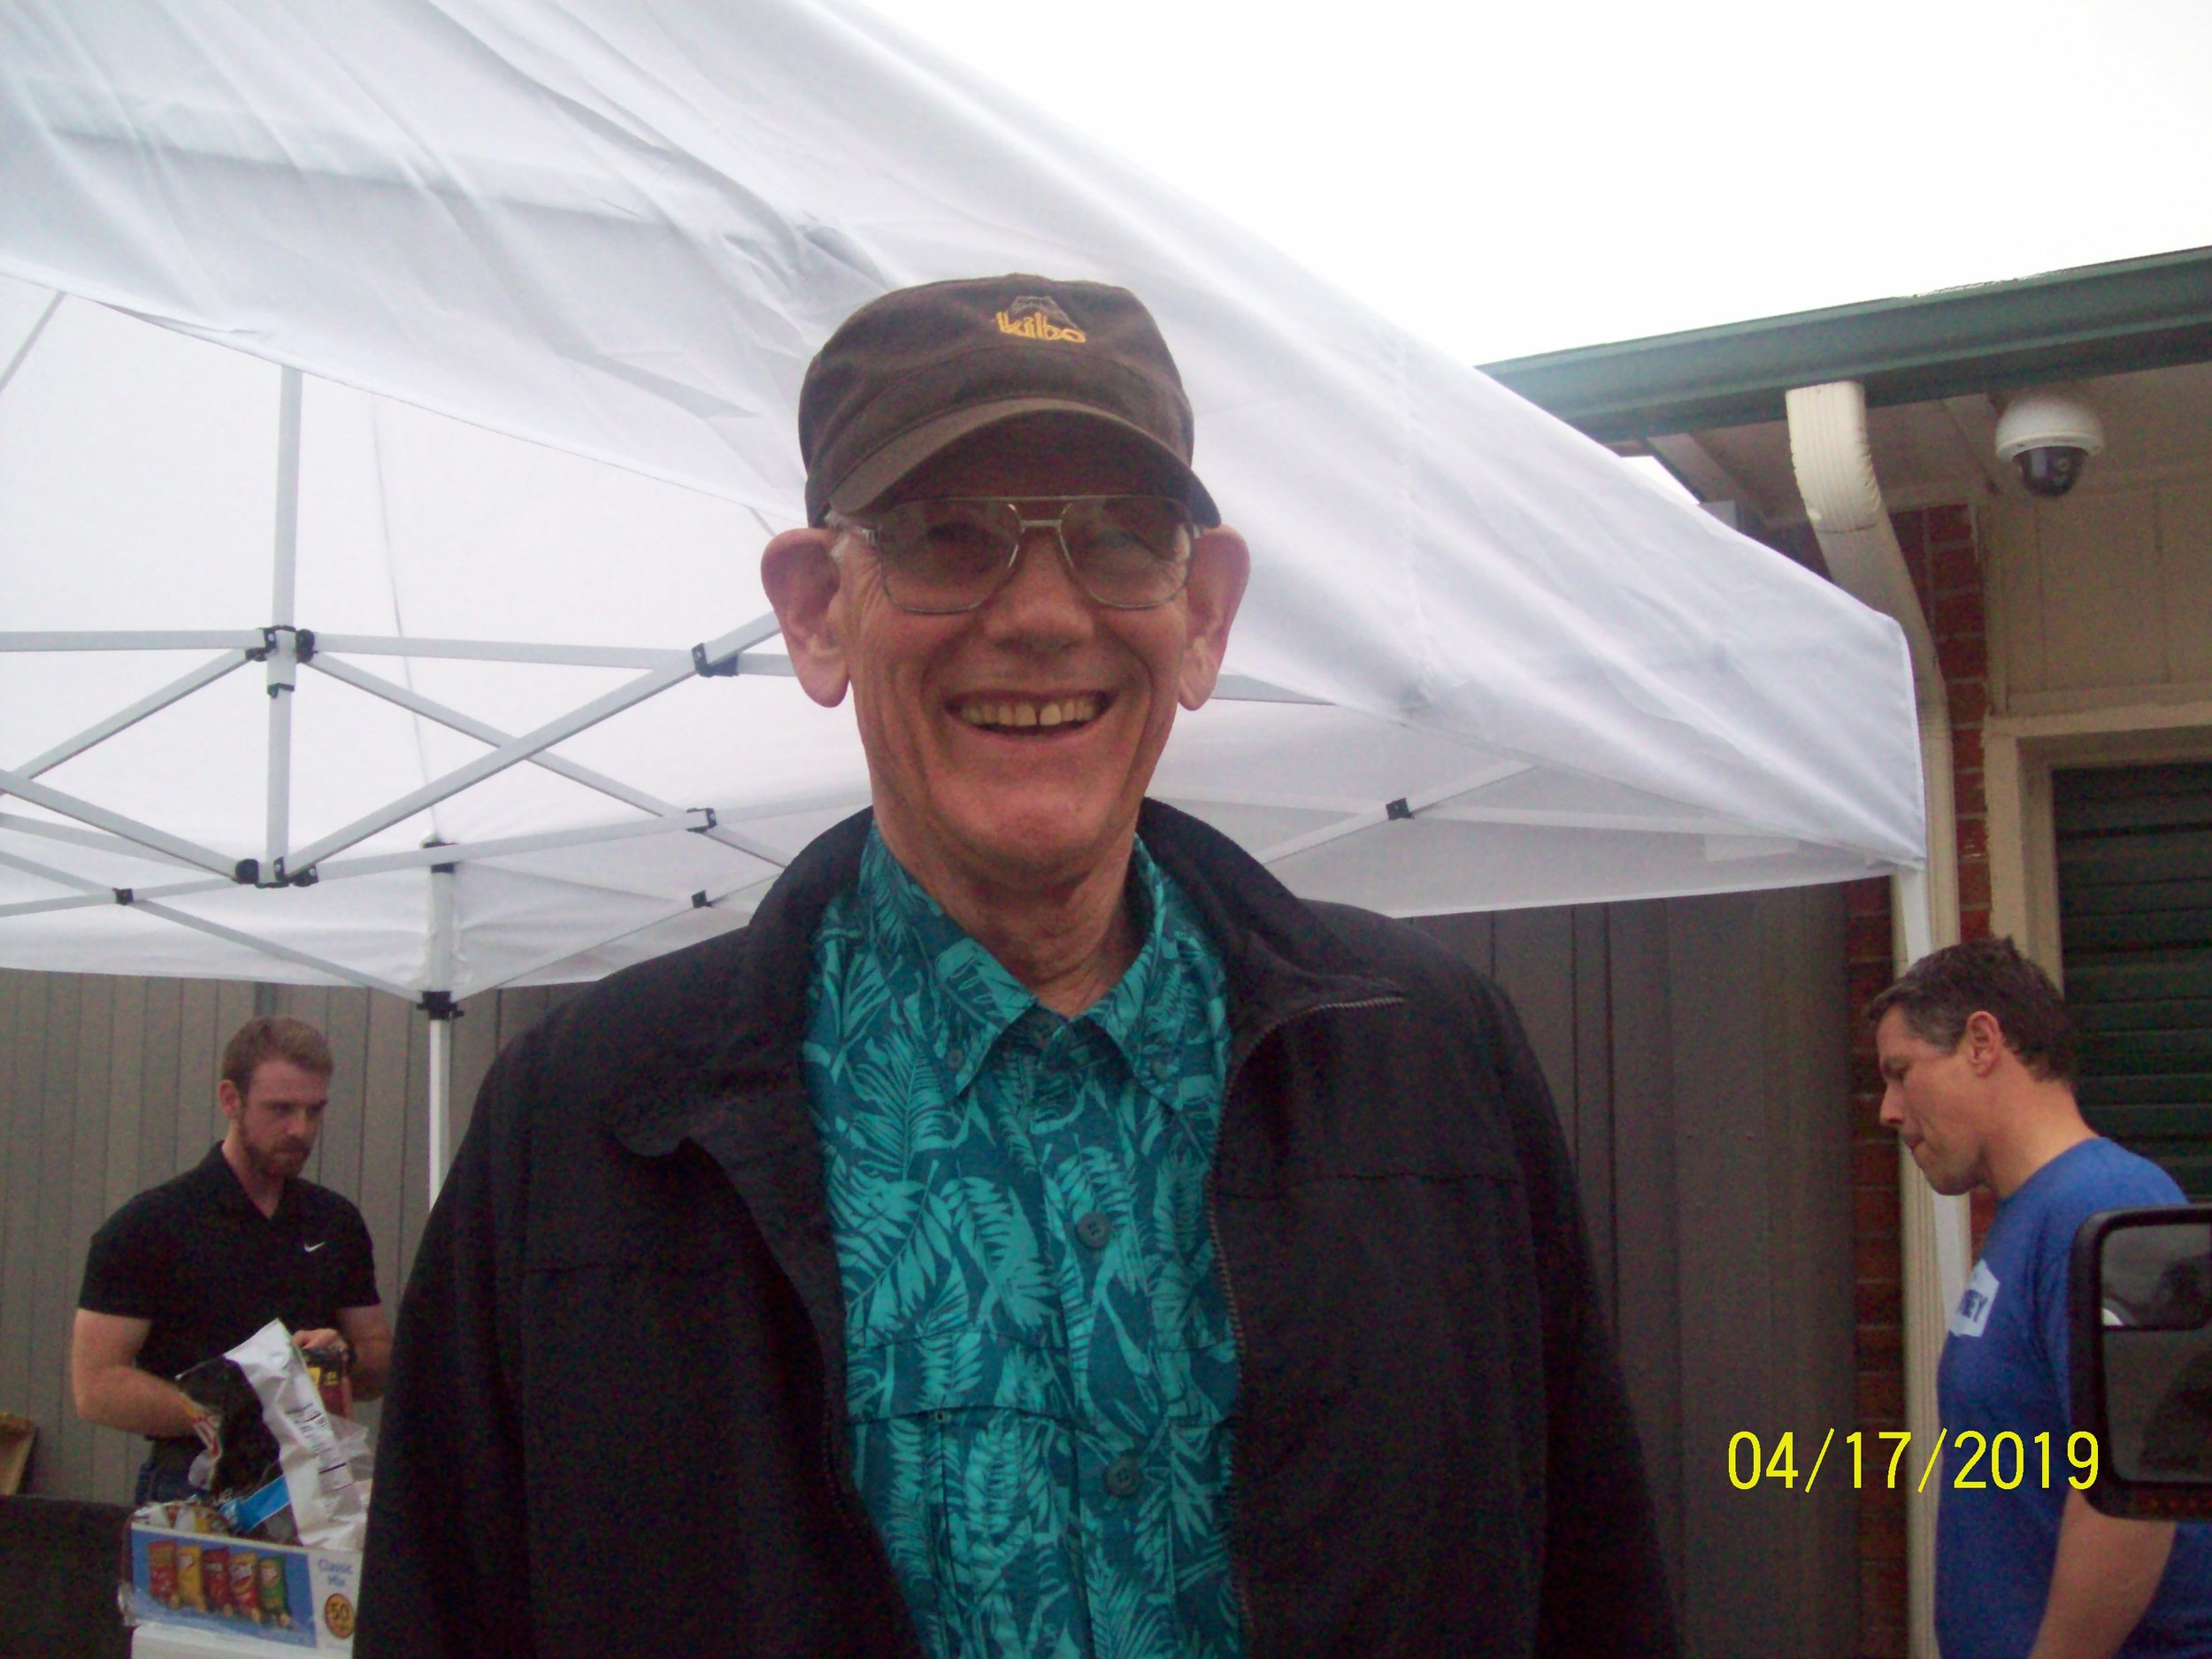 John Dickman